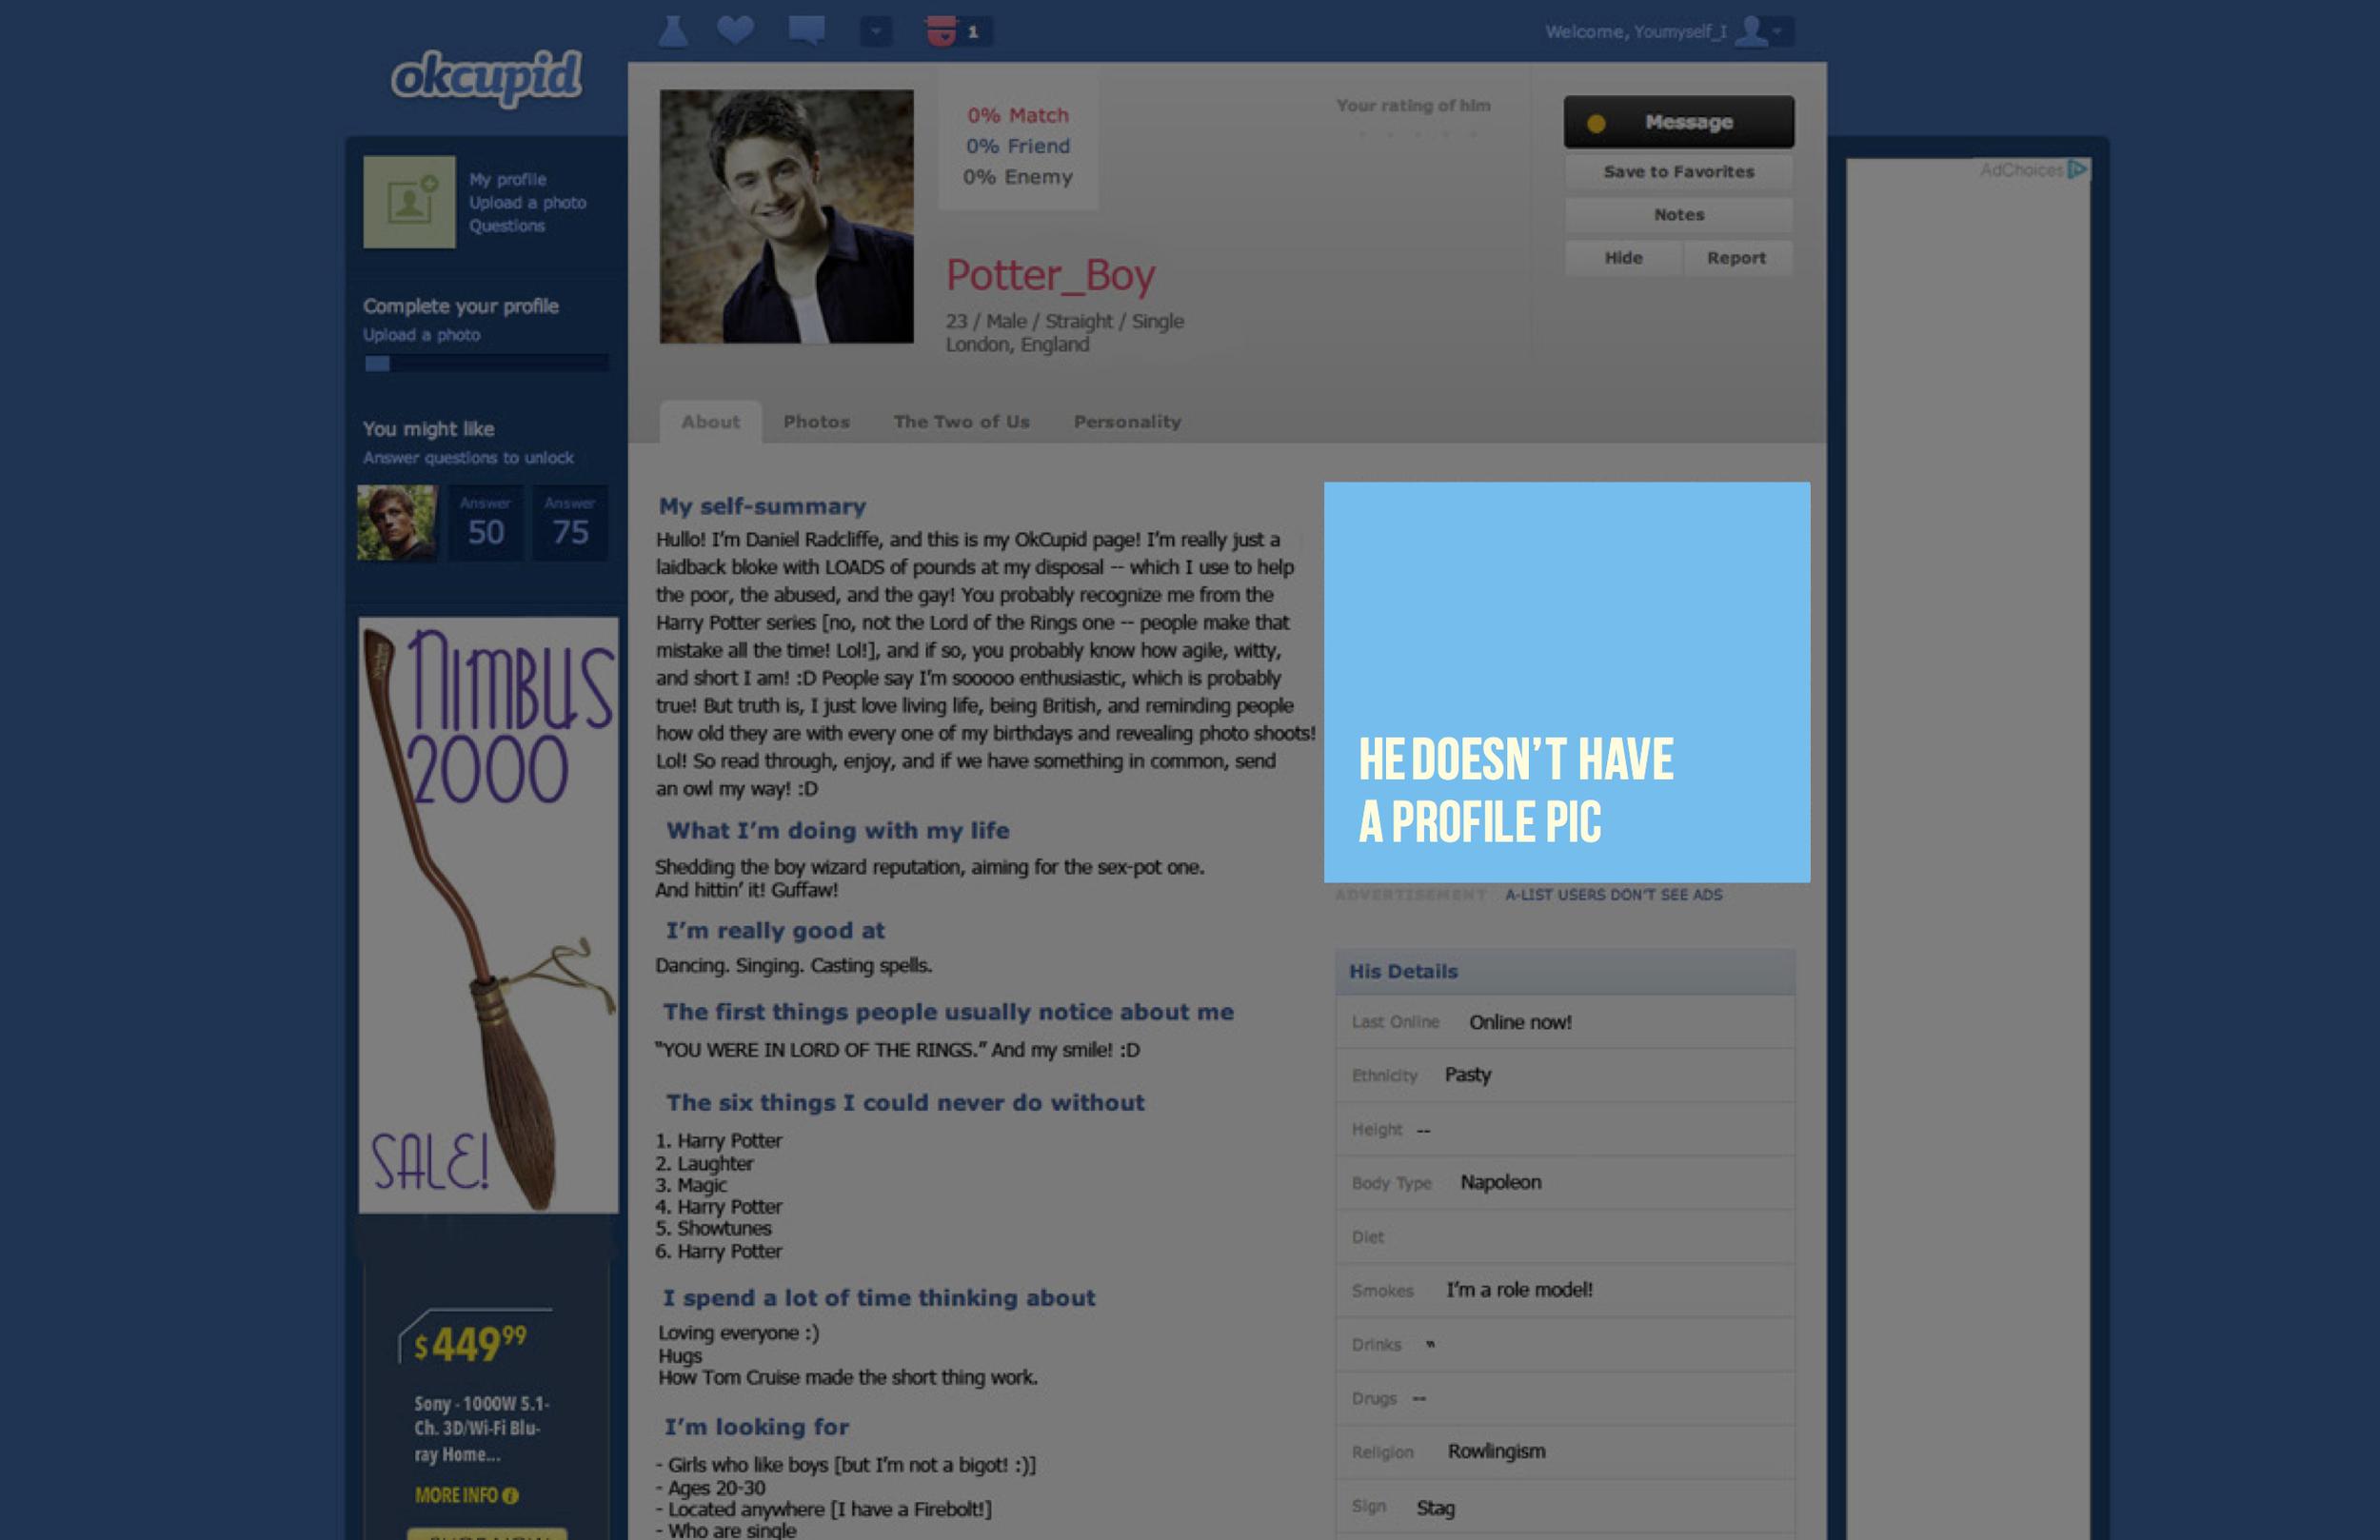 OkCupid-BannerAd-3jpg.jpg